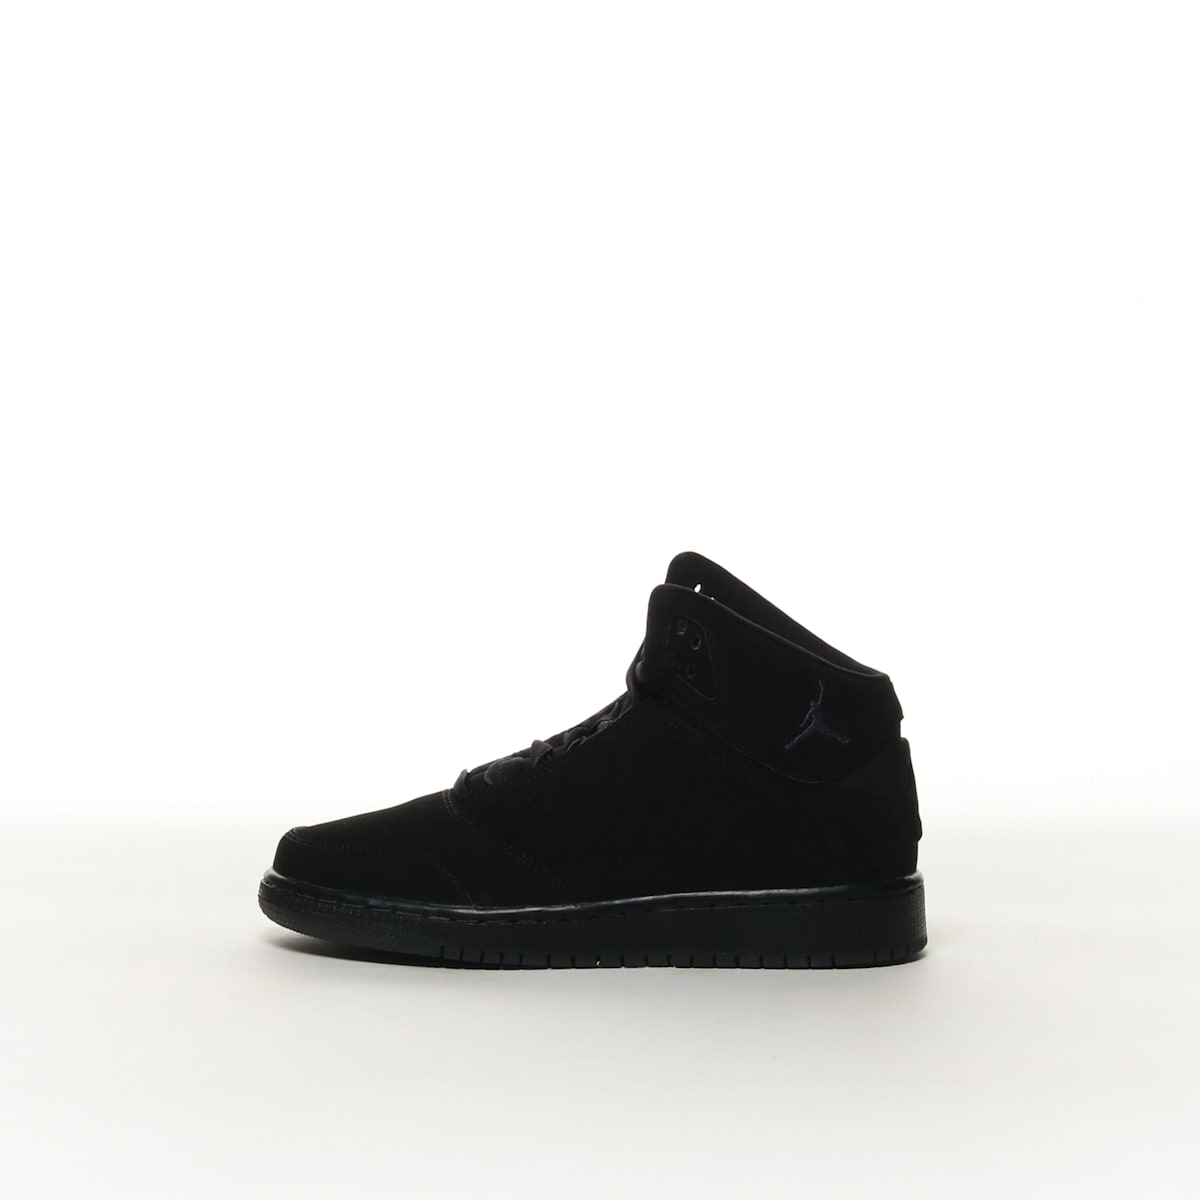 1440f2c0fb9f Boys  Jordan 1 Flight 5 Premium (GS) Shoe - BLACK ANTHRACITE – Resku